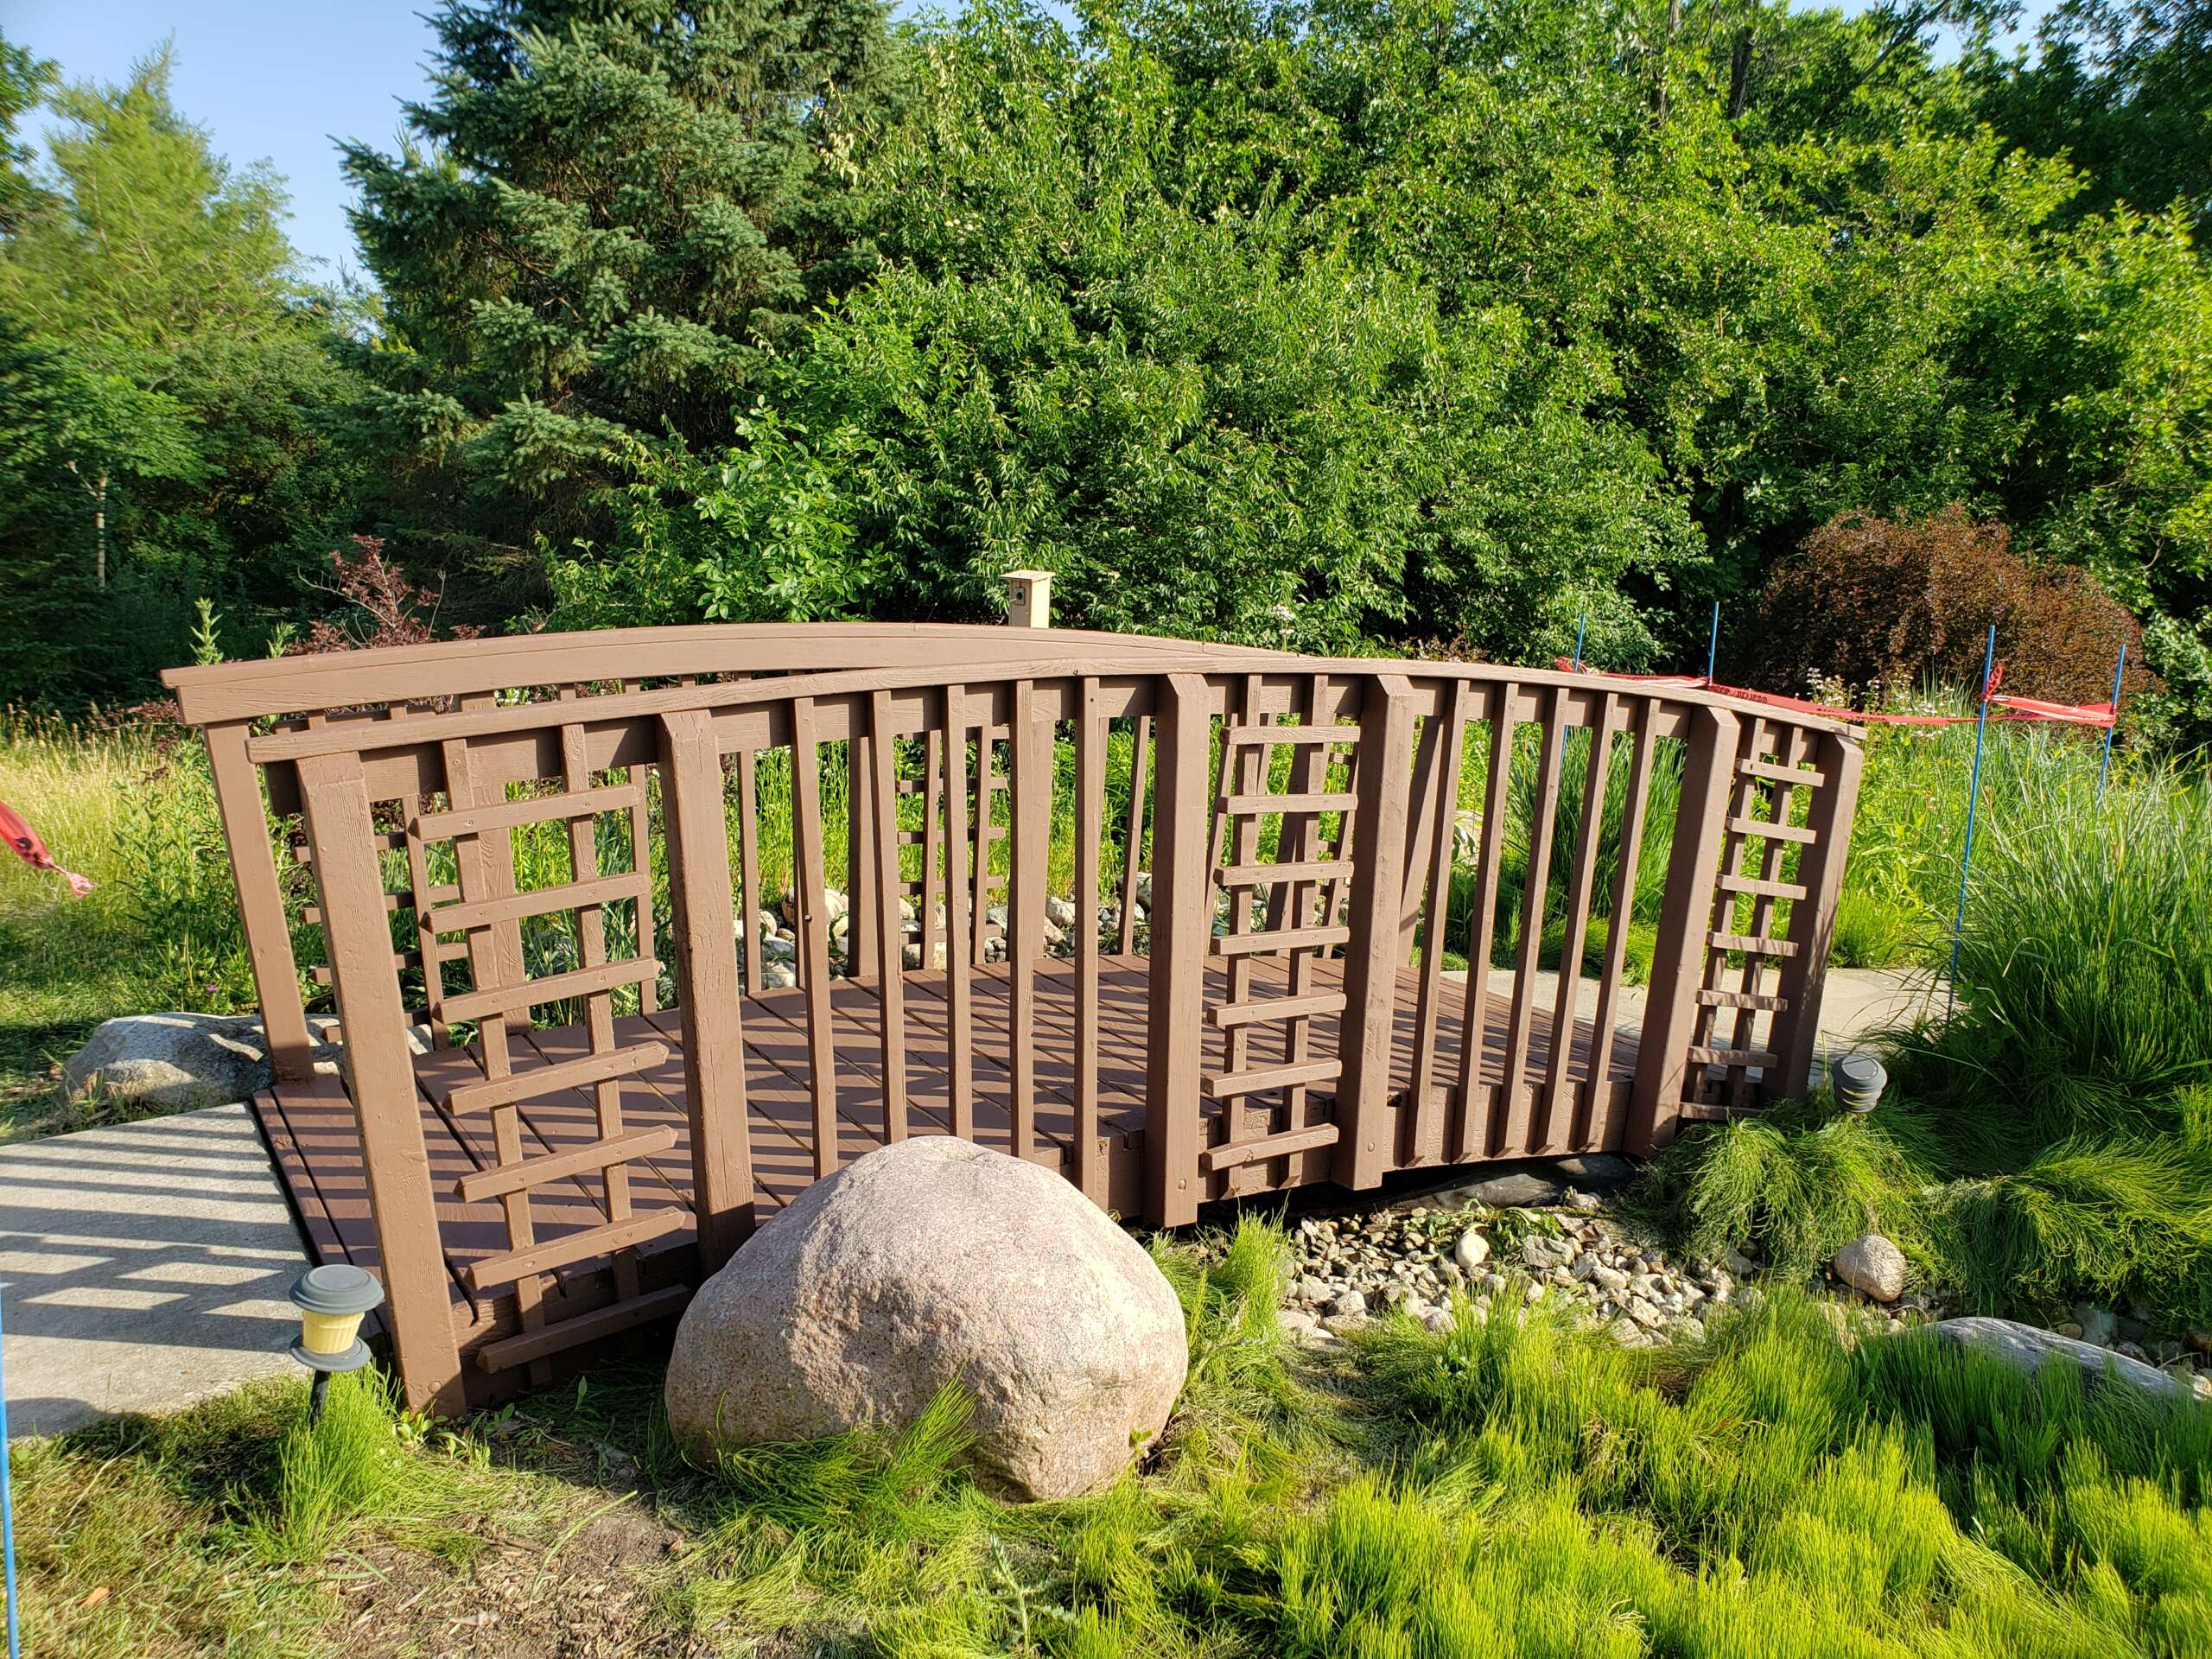 After Wooden Bridge Refinish